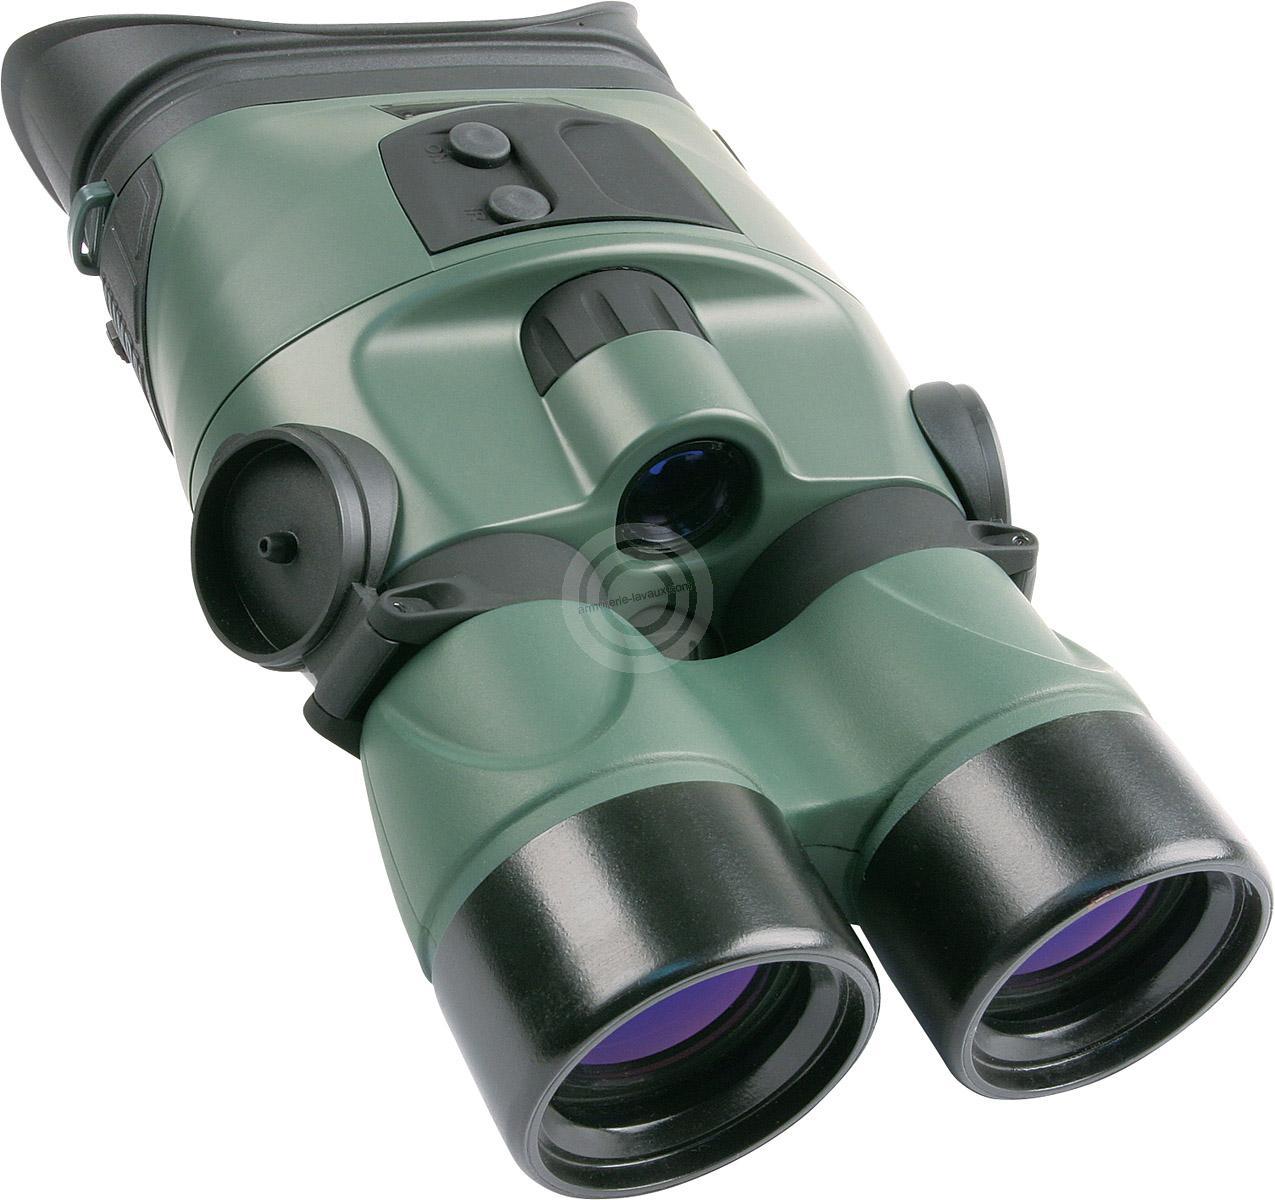 Jumelles Vision Nocturne YUKON Tracker 2x24 - NVB 3,5x40